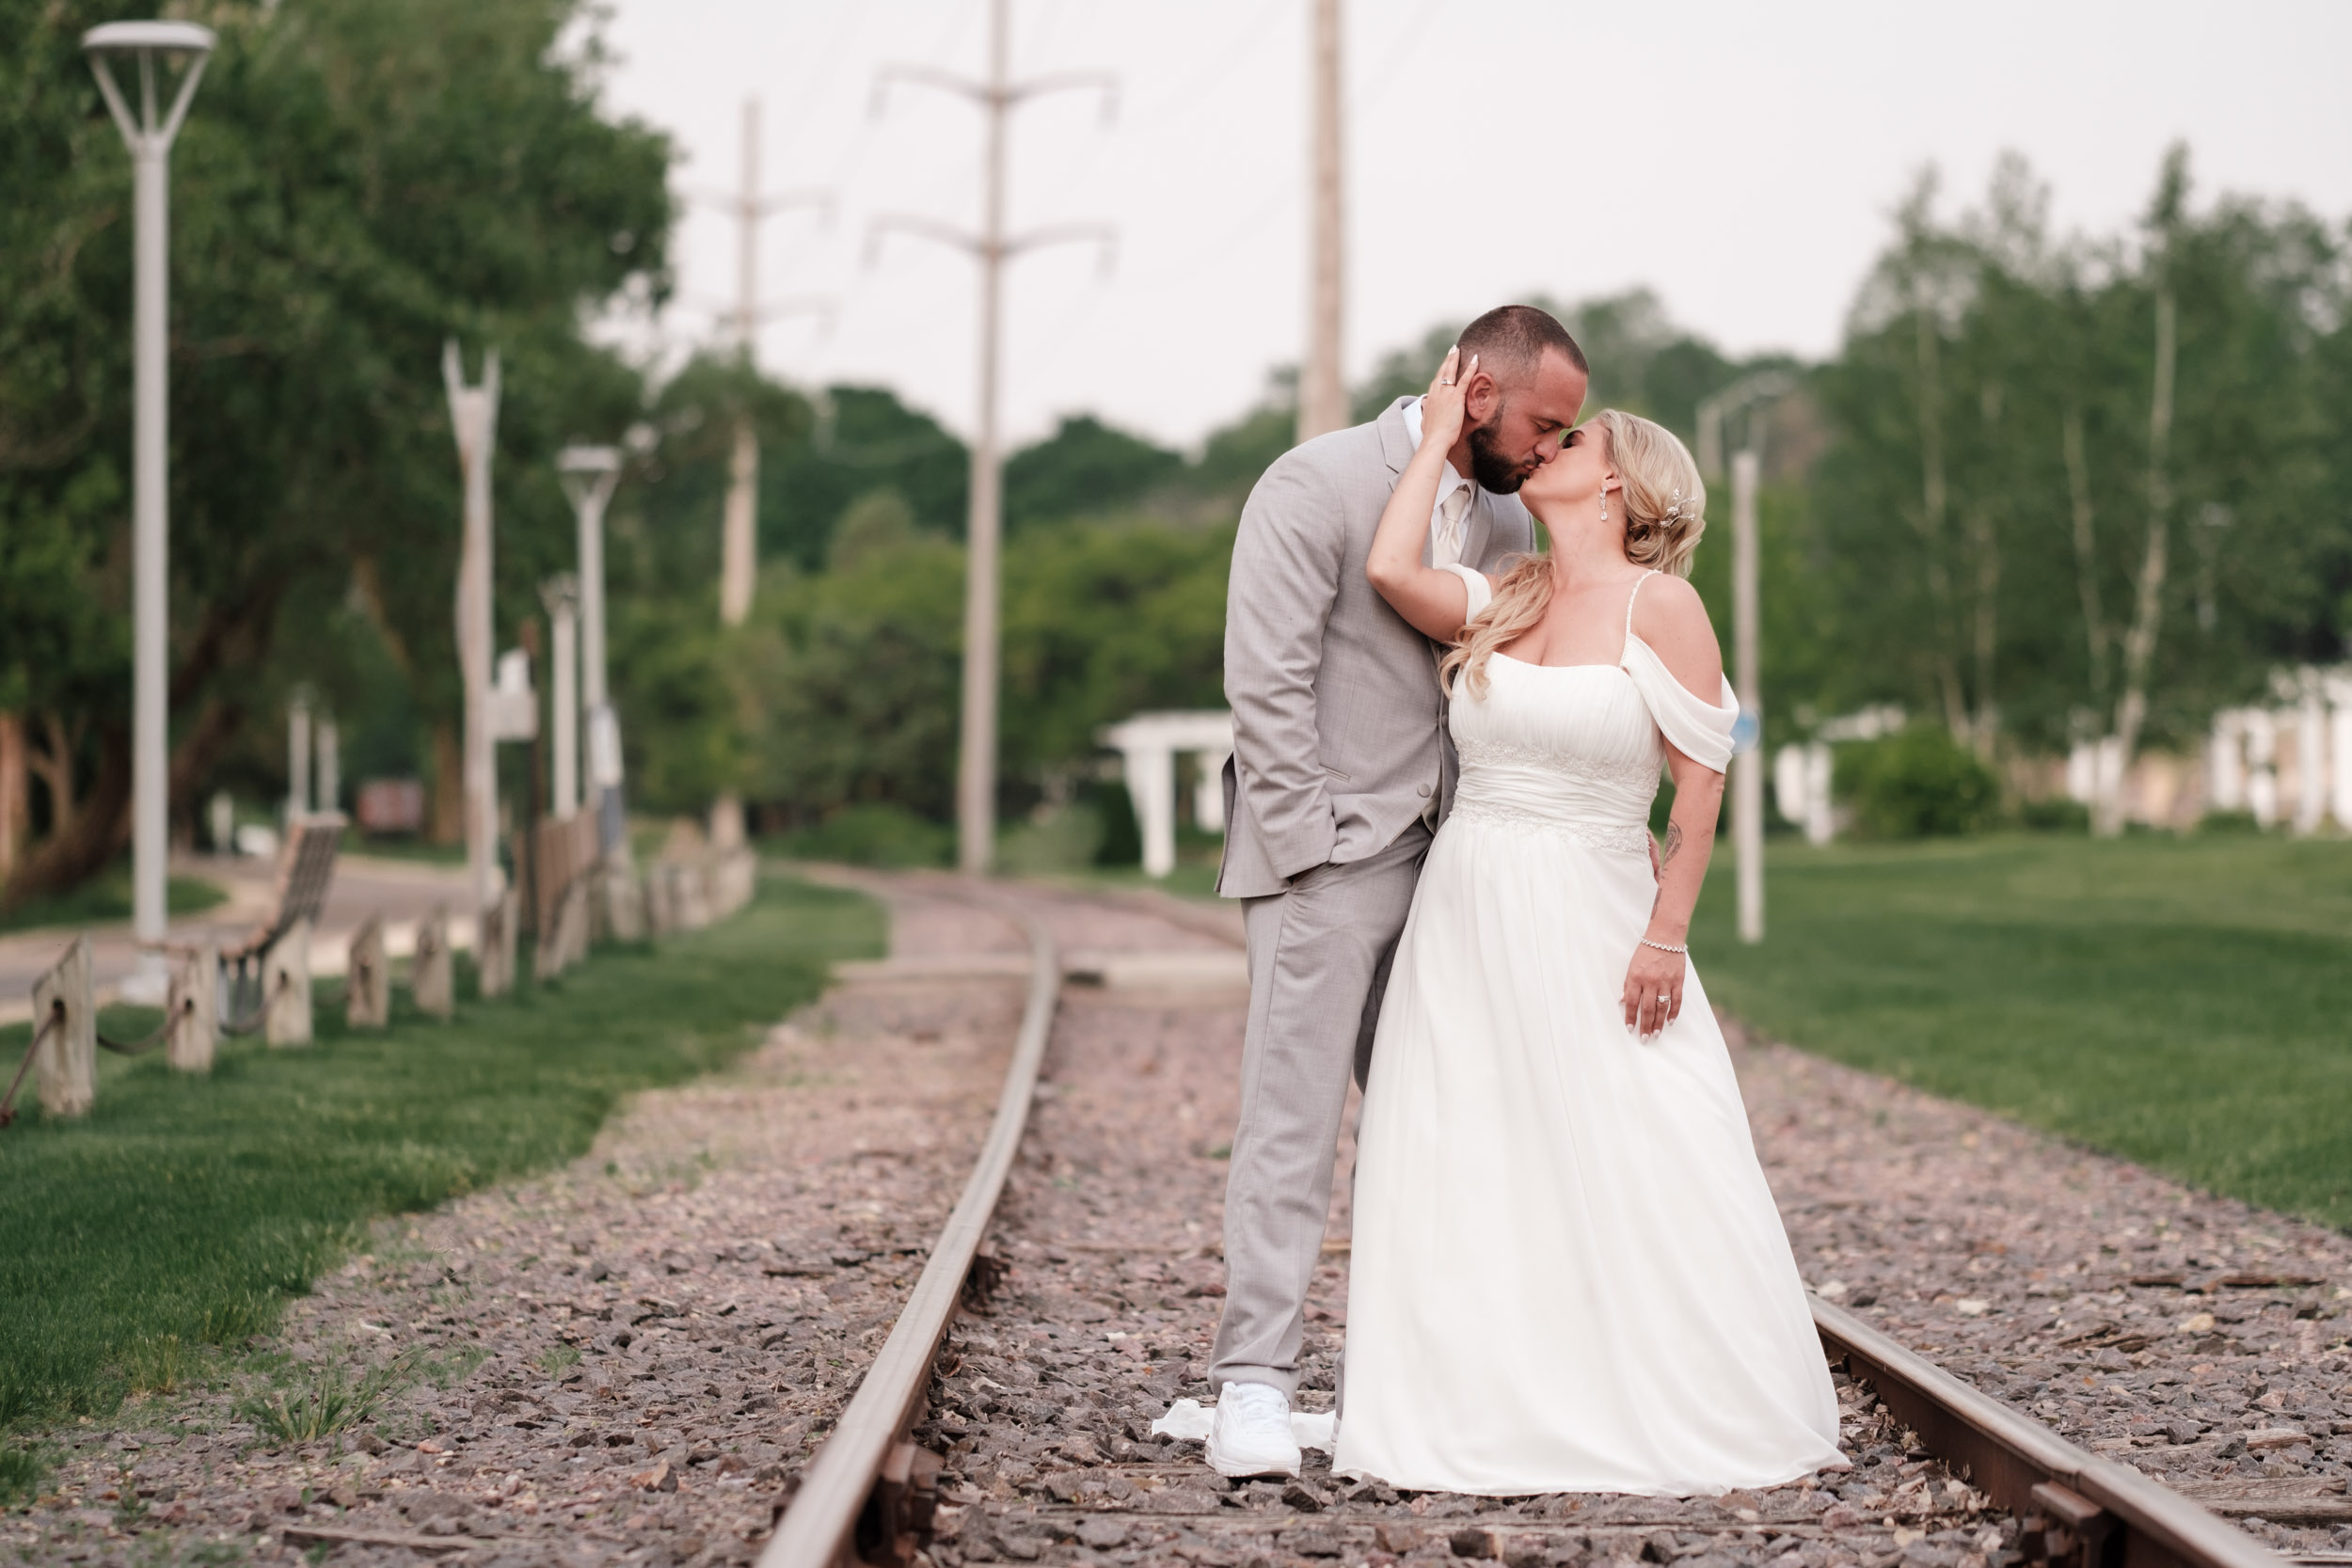 19-06-01 Megan Josh - Nicholas Conservatory Wedding-53.jpg